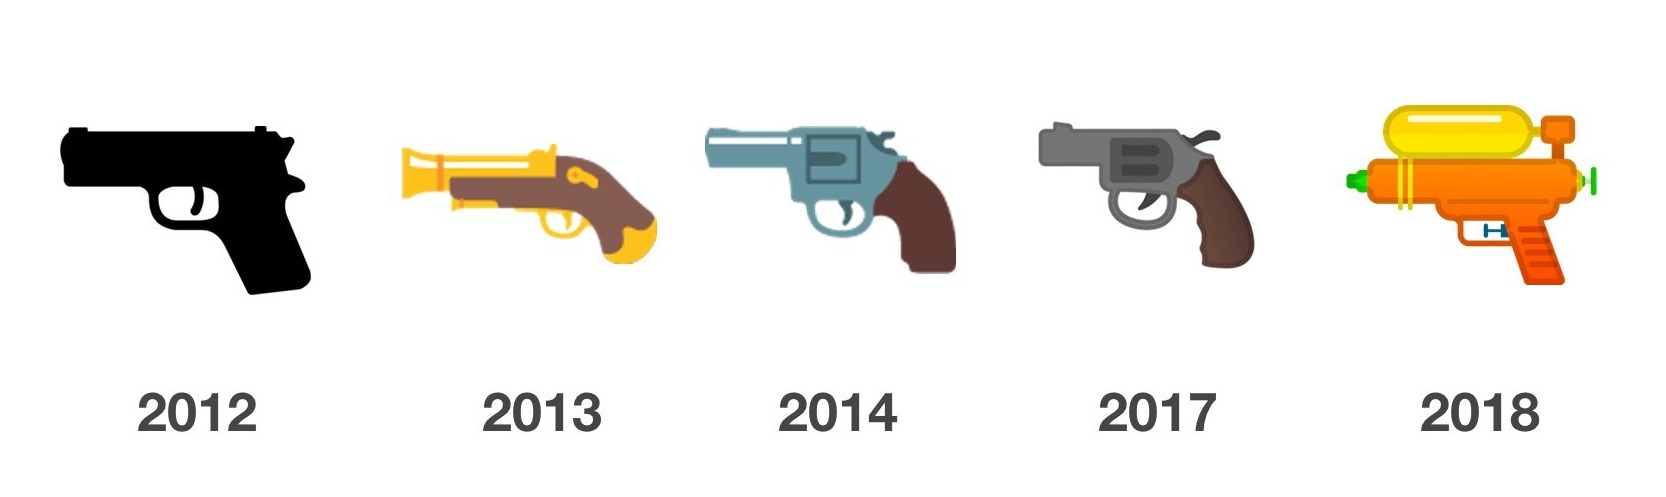 revolver ikonky